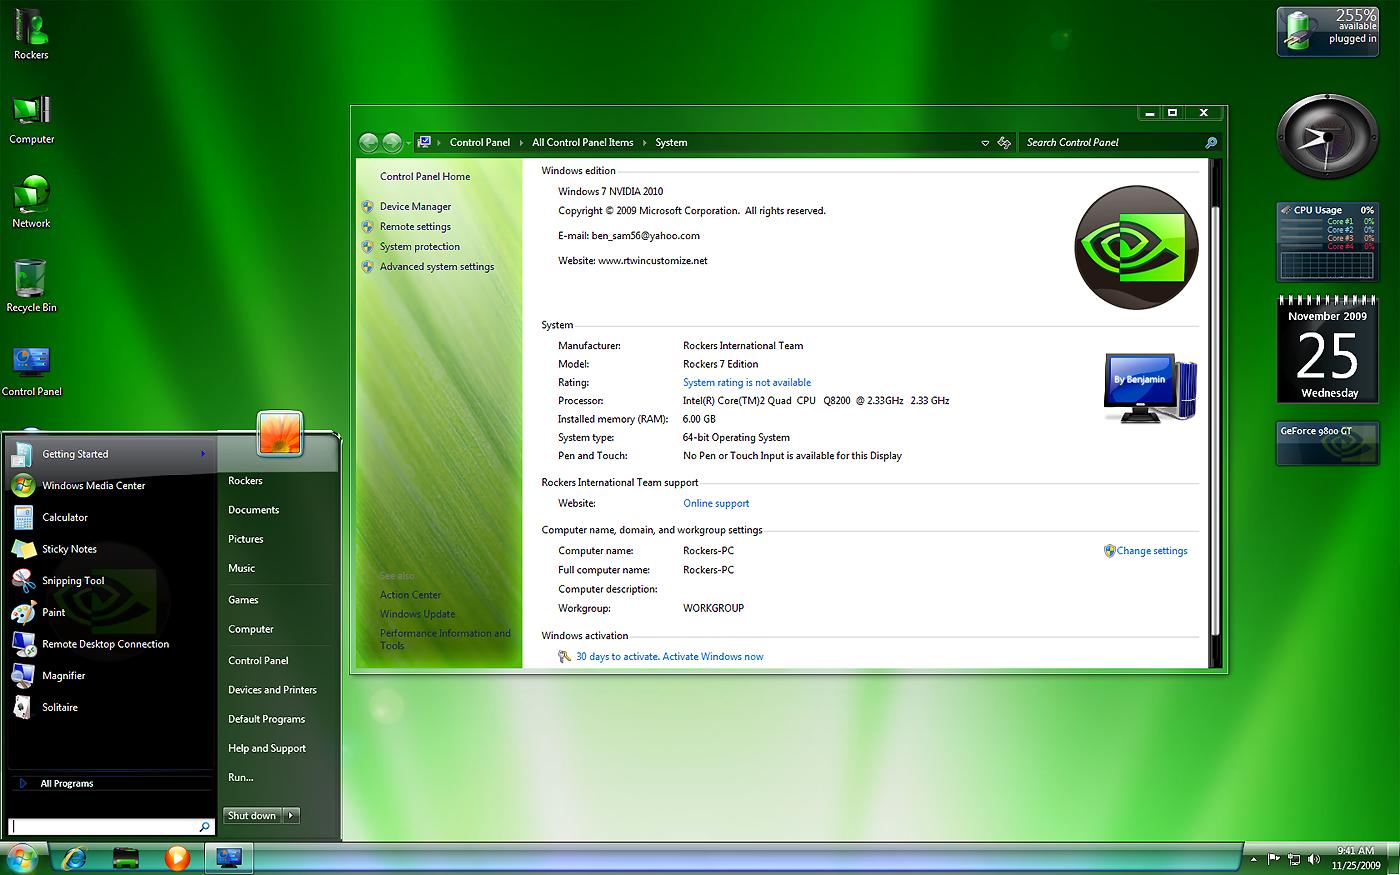 NVIDIA nForce System Management Controller on Drivers Informer